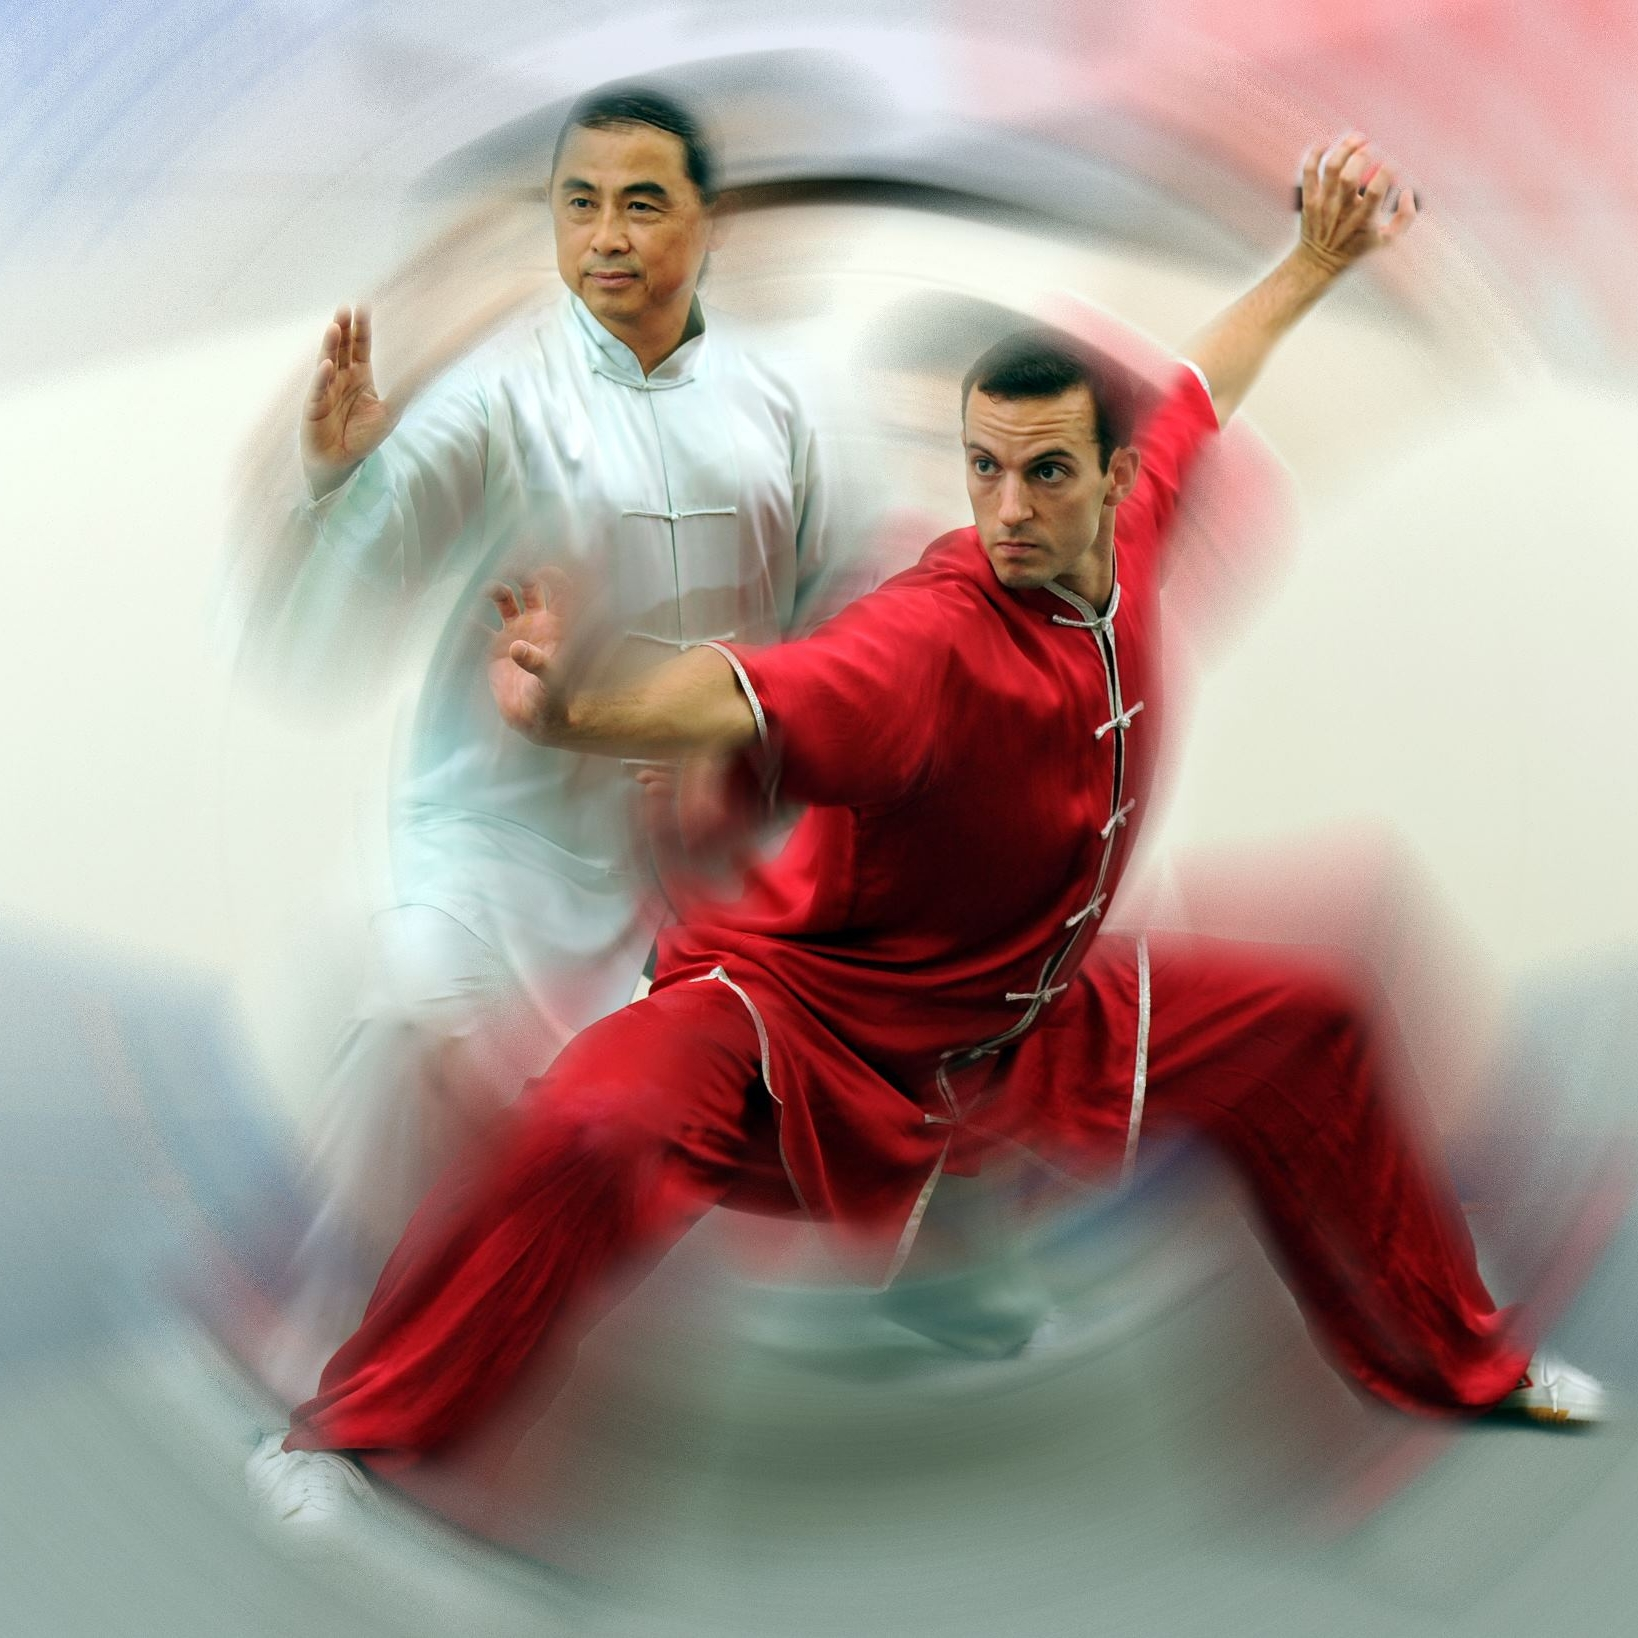 banner-inside-kungfuforms.png